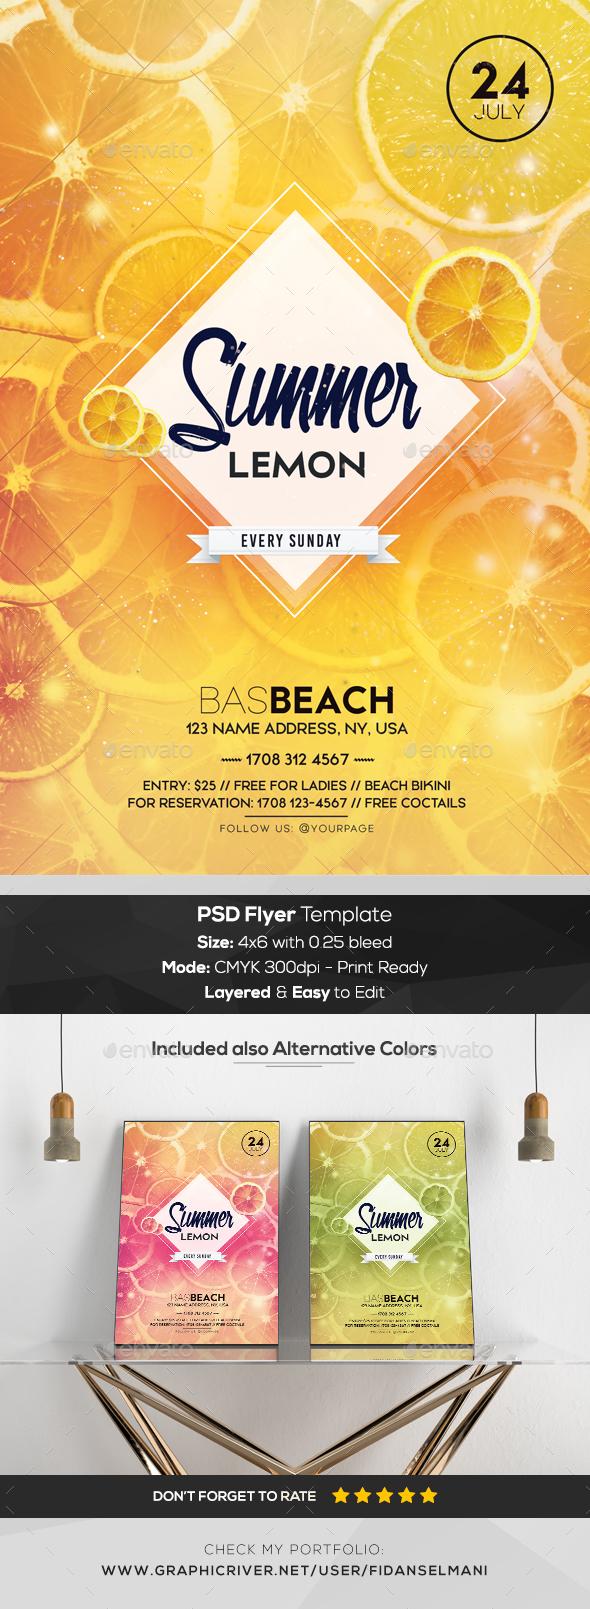 Summer Lemon - PSD Flyer Template - Flyers Print Templates